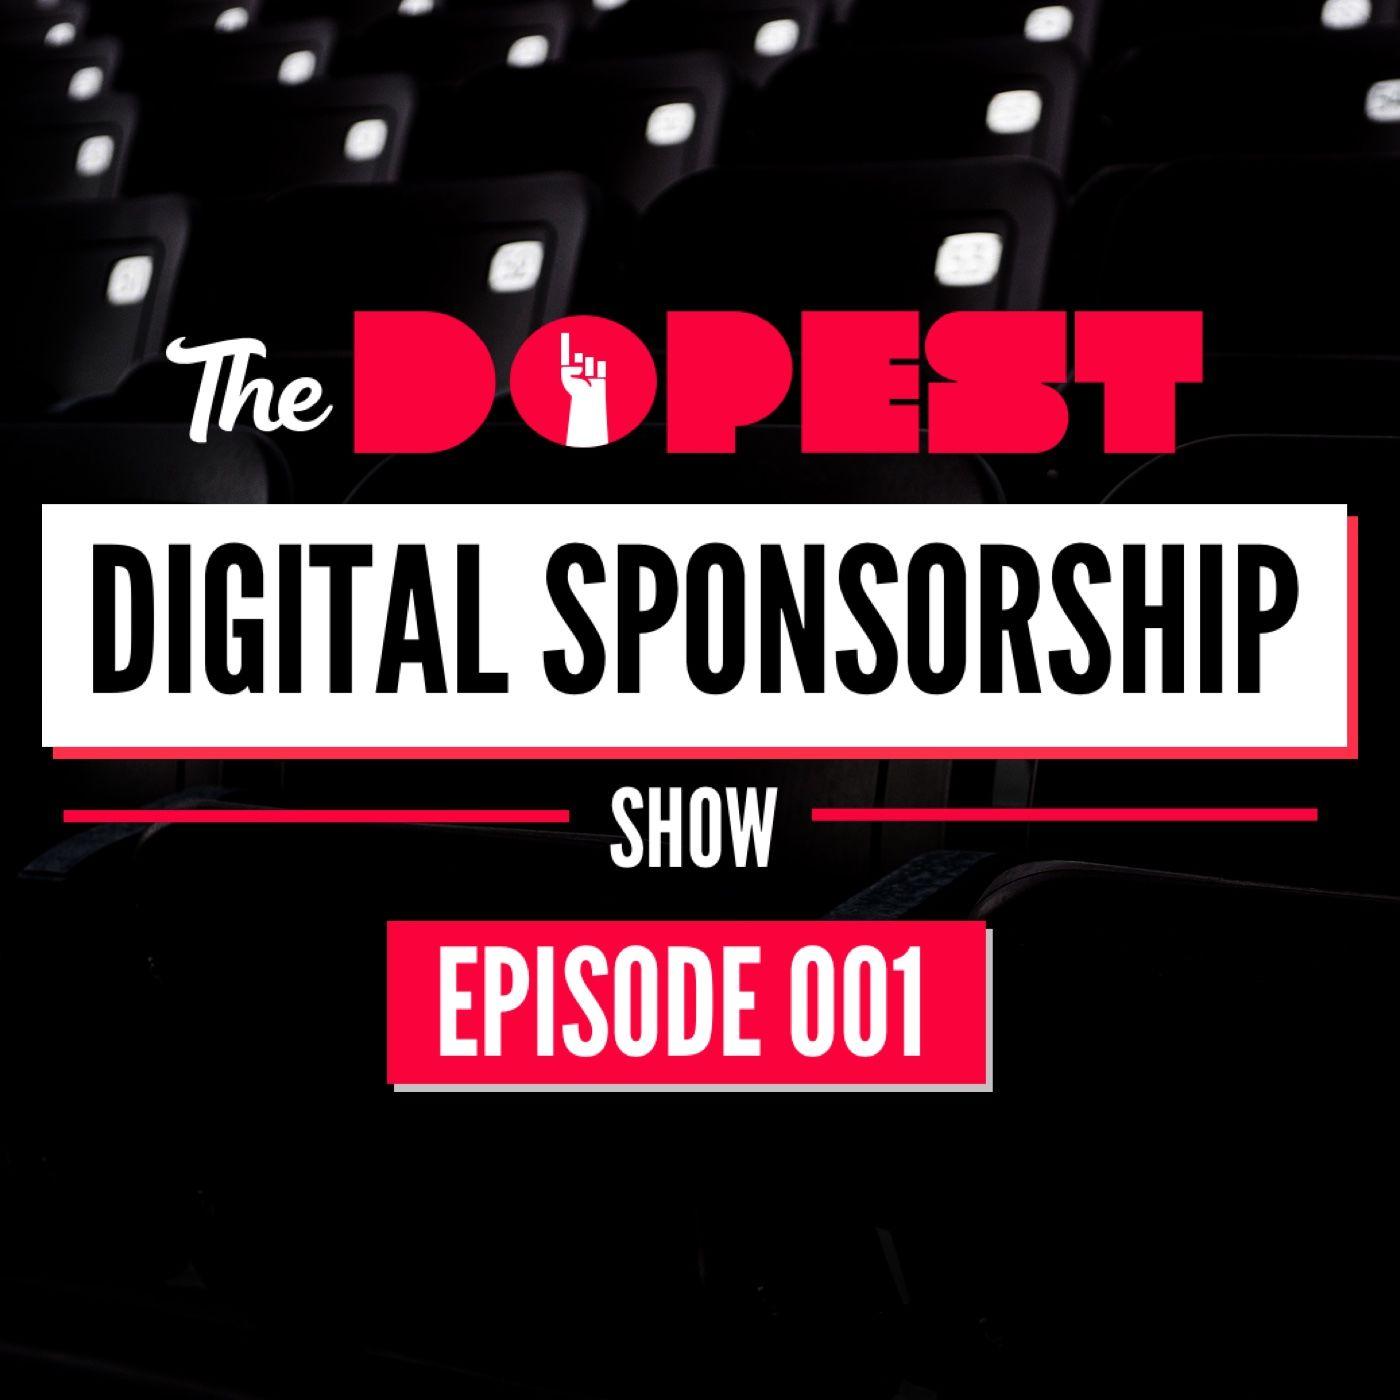 The Dopest Digital Sponsorship Show - EP 001